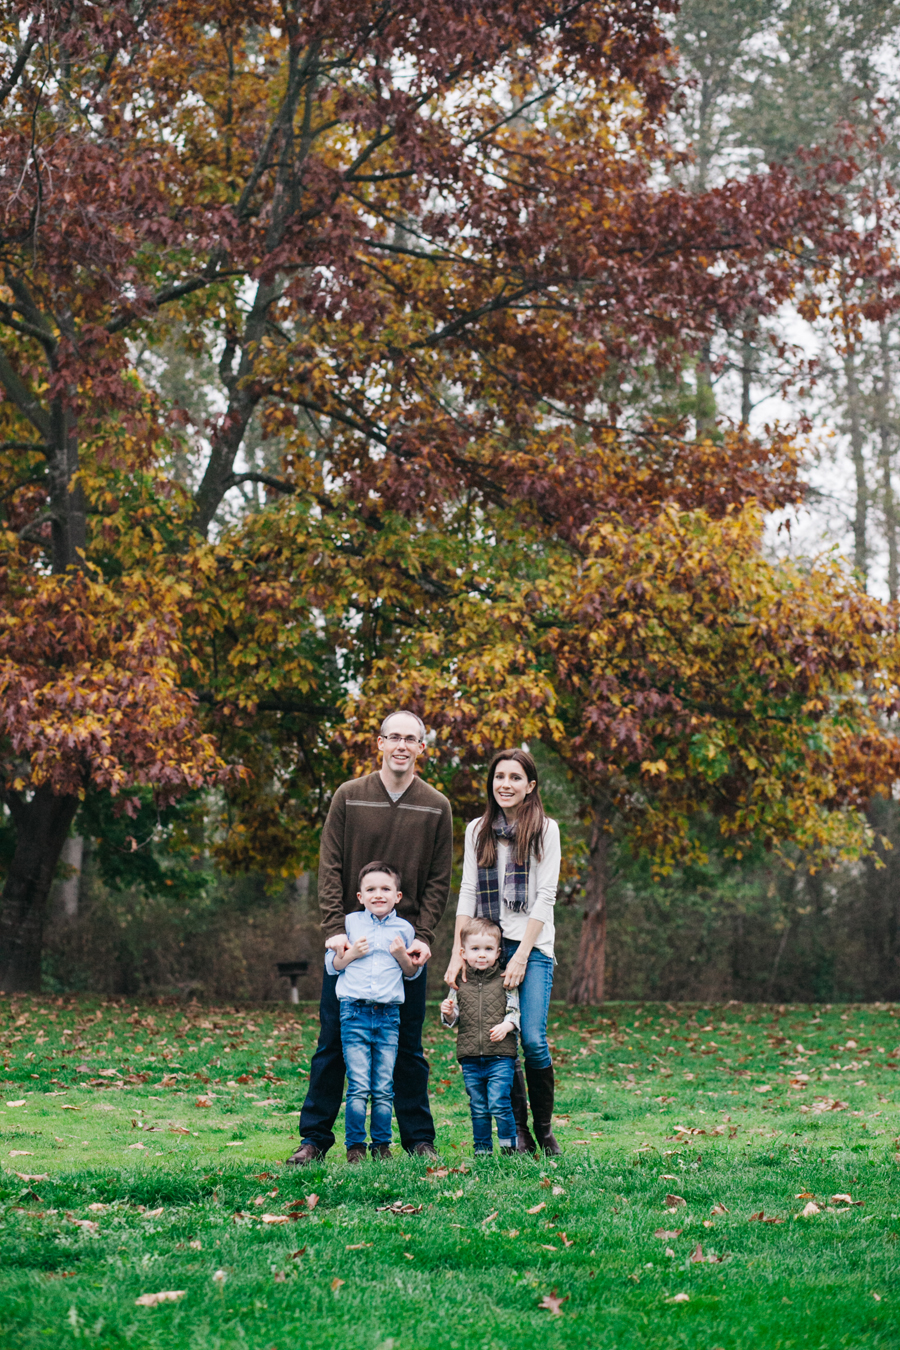 012-bellingham-family-photographer-hovander-park-burdick-katheryn-moran-photography.jpg